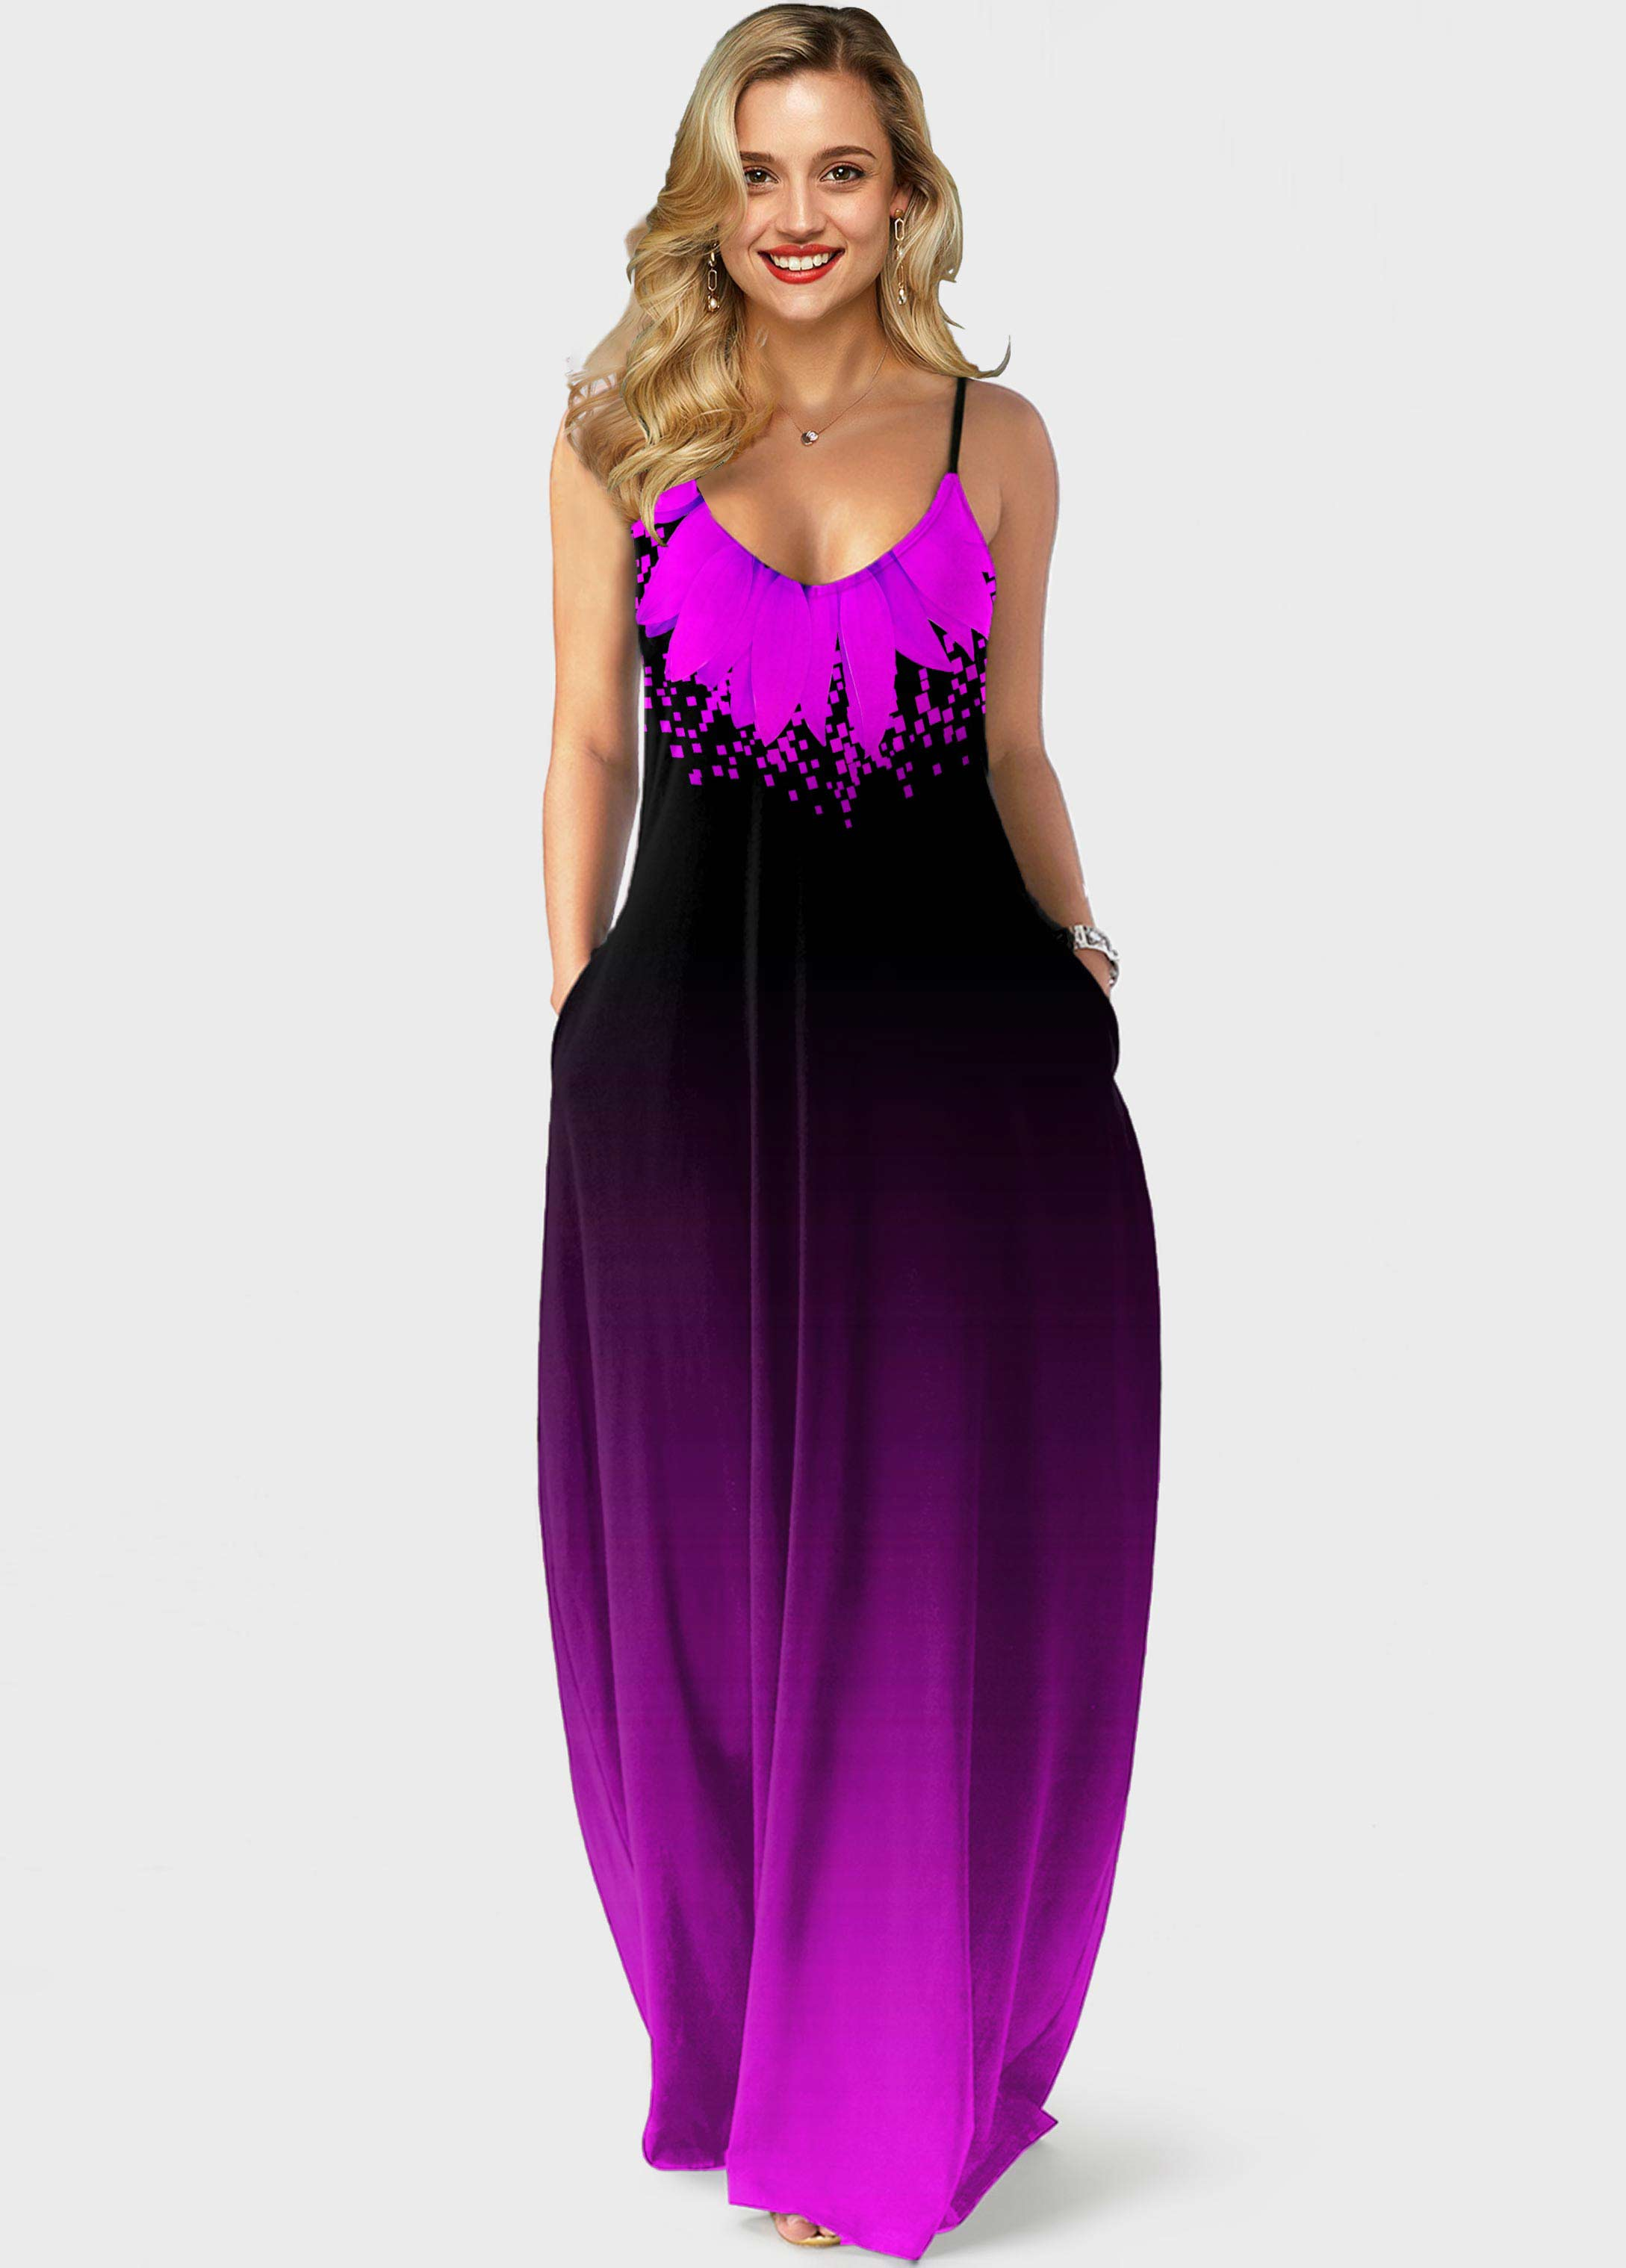 ROTITA Side Pocket Purple Gradient Spaghetti Strap Maxi Dress